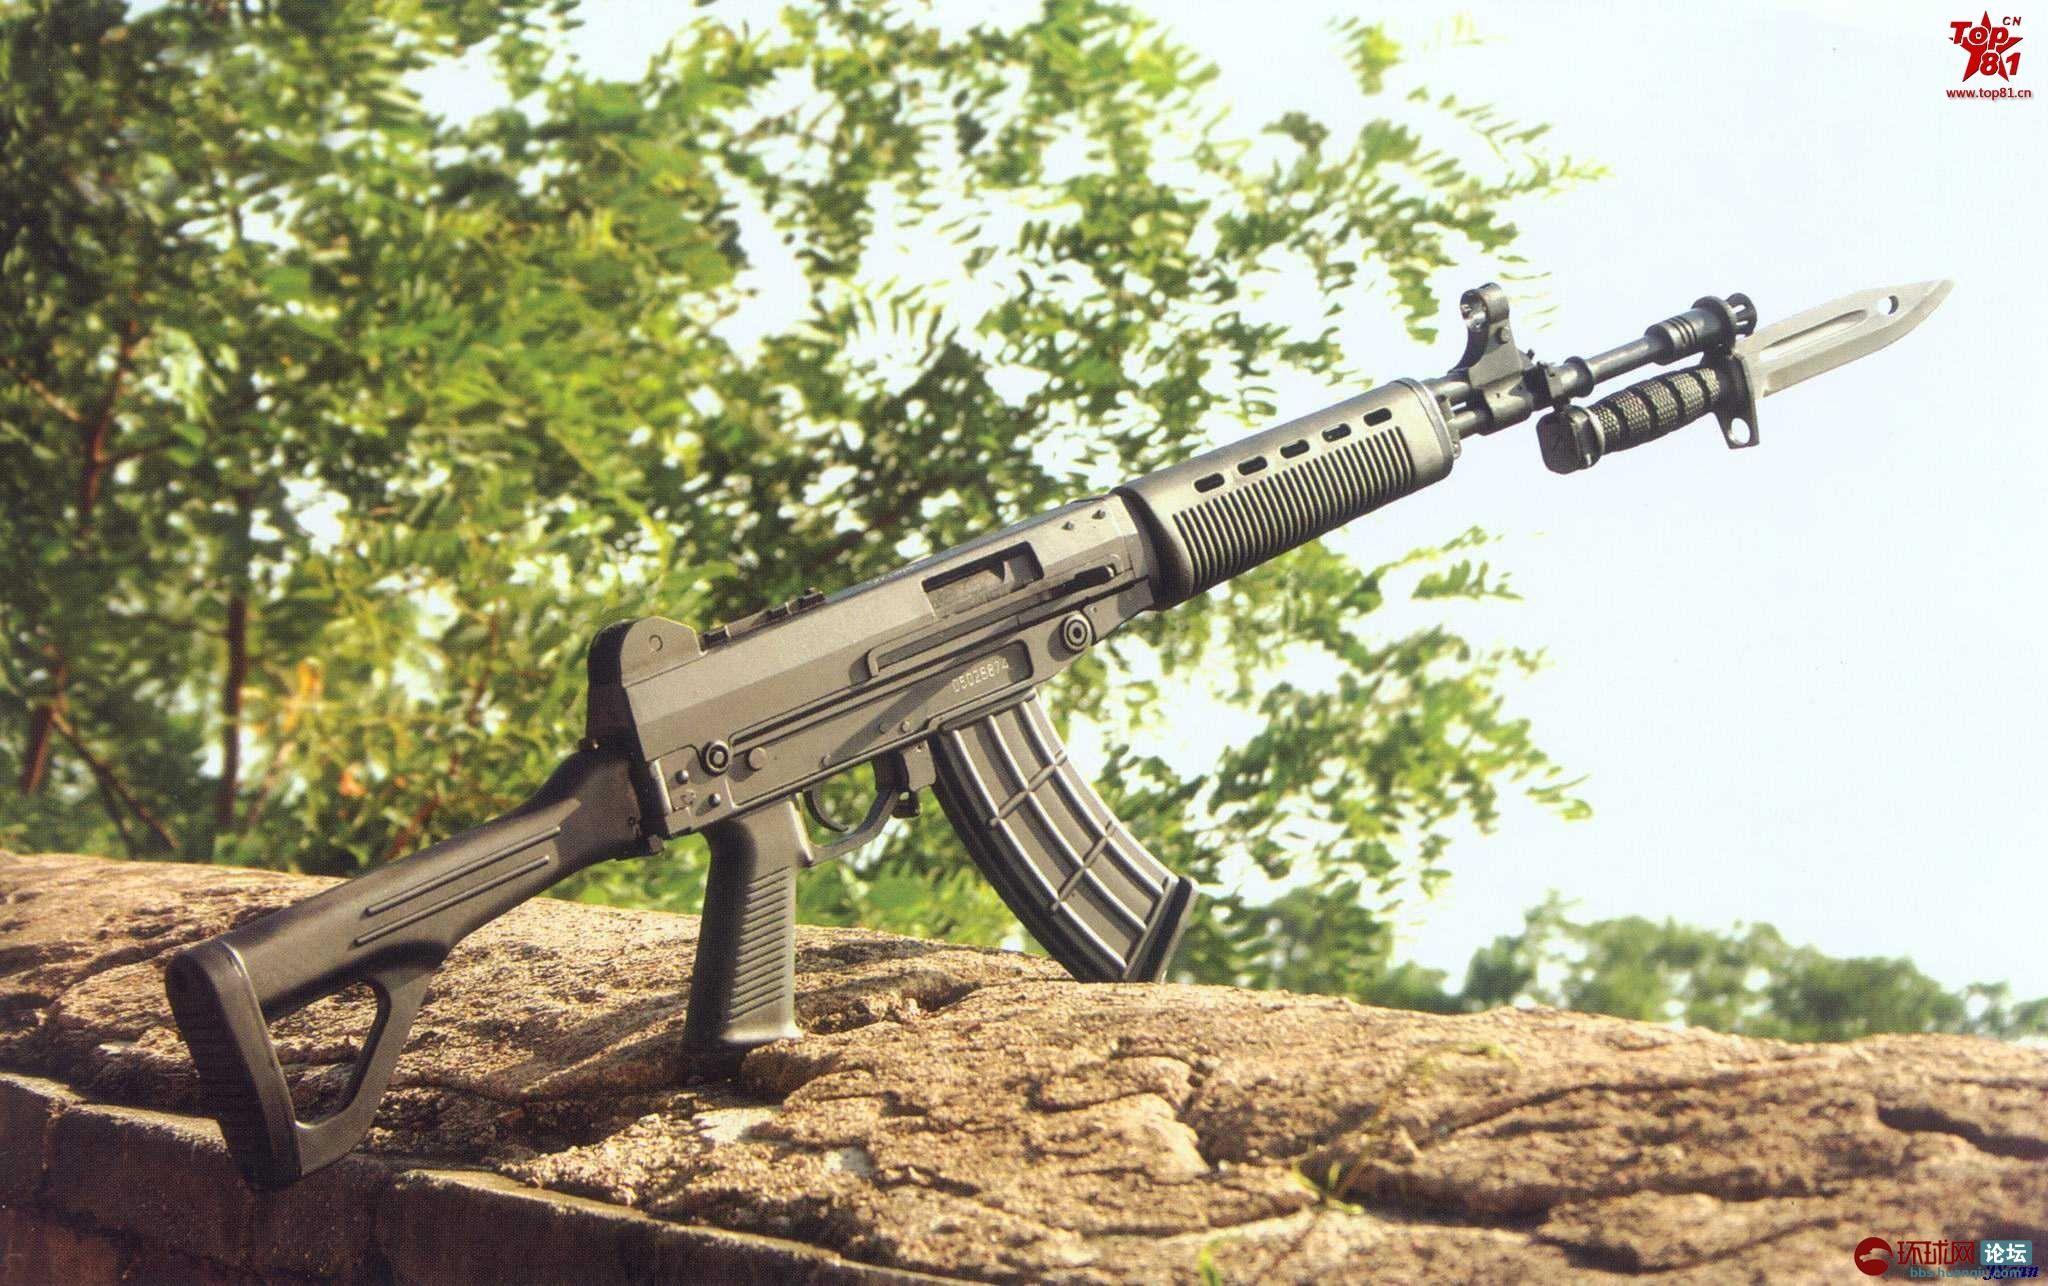 中国03式自动步枪与刺刀 / Chinese Type-03 assault rifle with